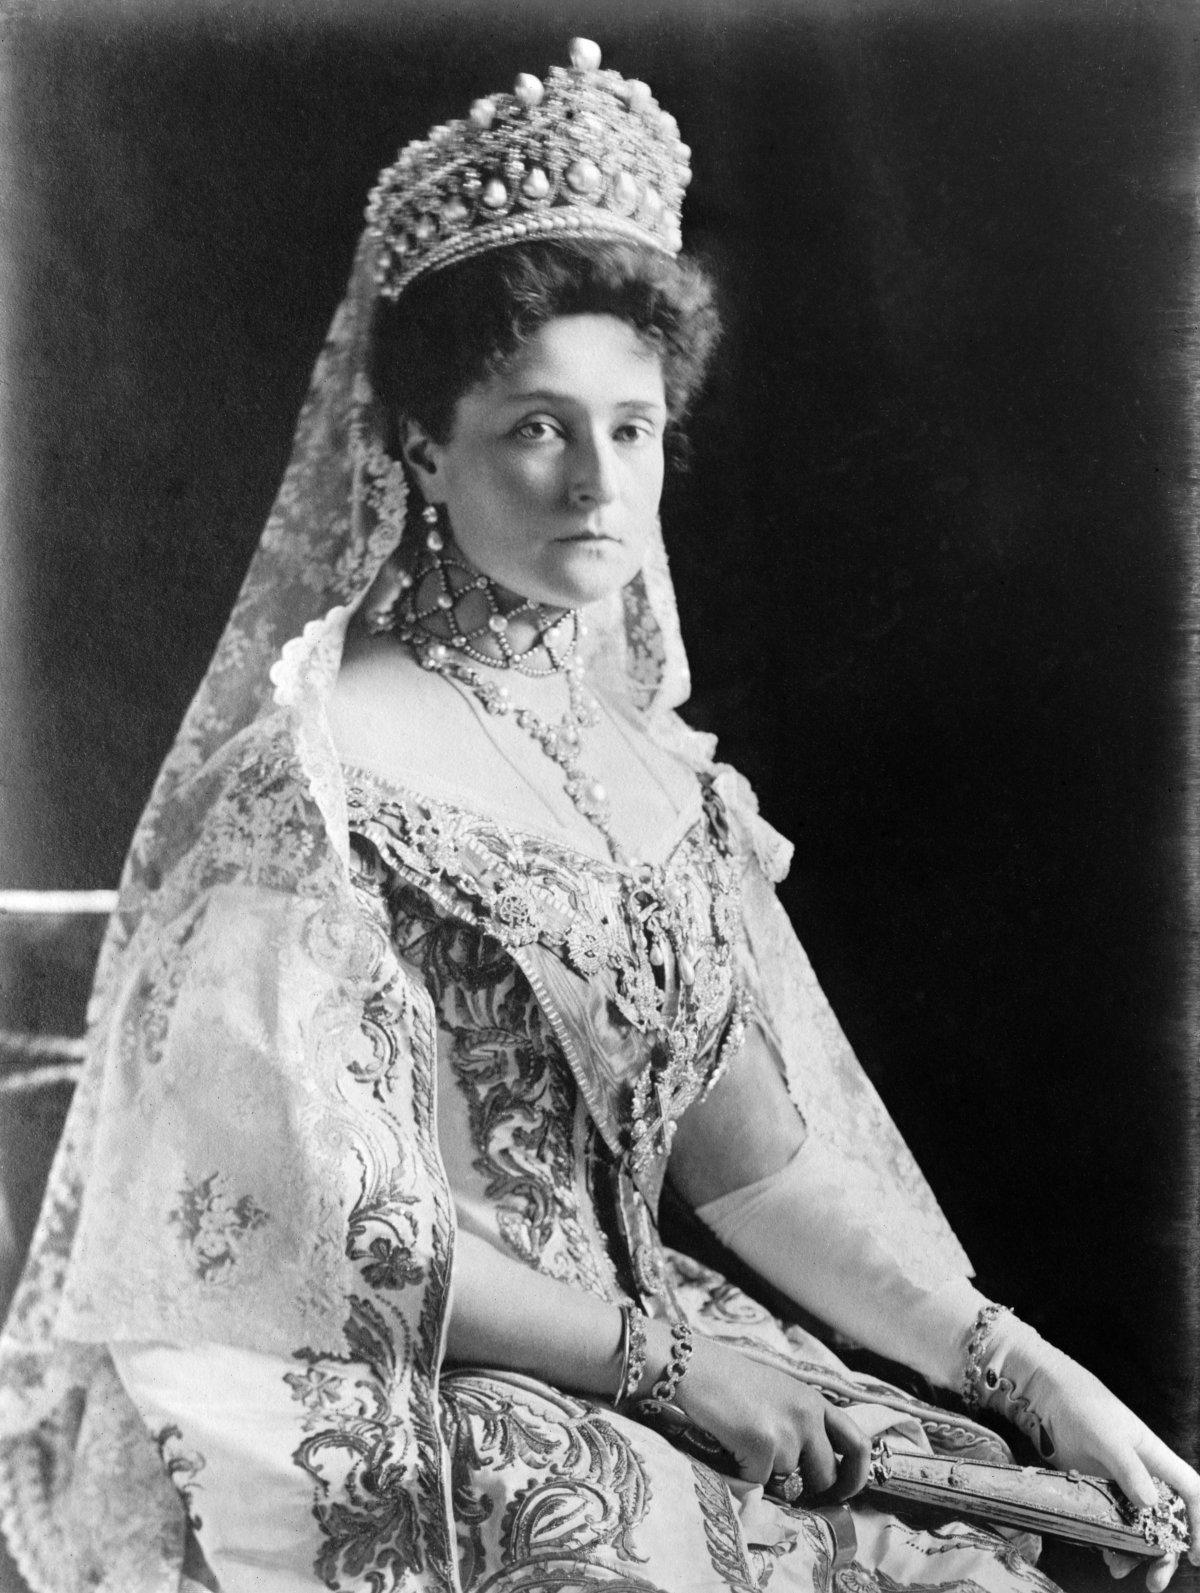 Empress Alexandra Feodorovna, photographed by Boasson and Eggler St. Petersburg Nevsky 24